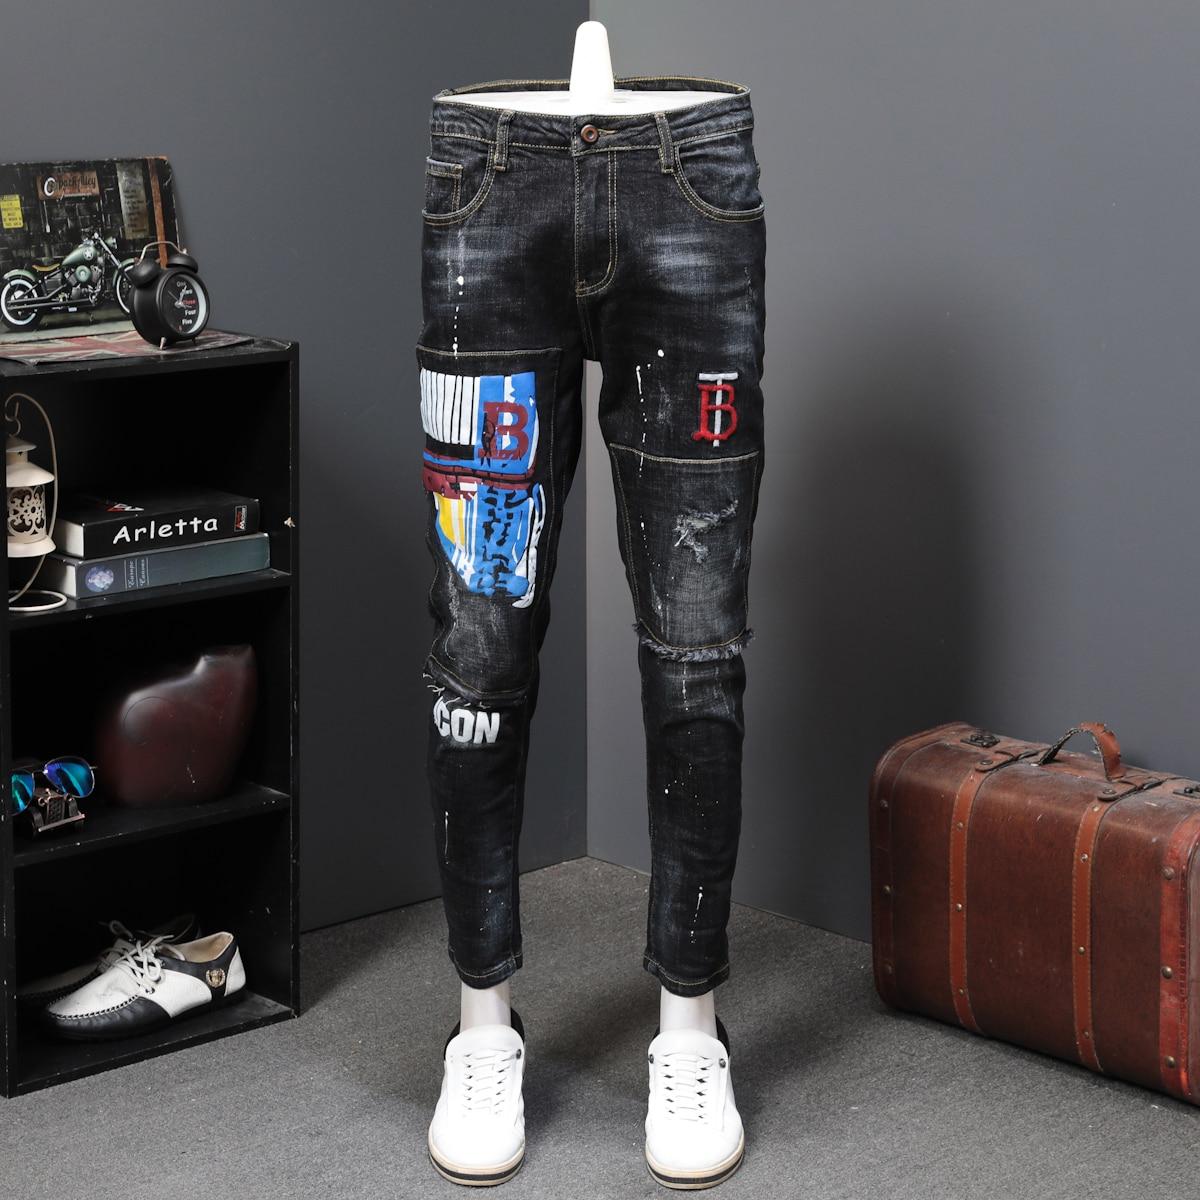 Black Spring Men Long Trousers Fashion Print Jeans Male Colored Drawing Painted Slim Denim Pants Designer Jeans Printing Jeans